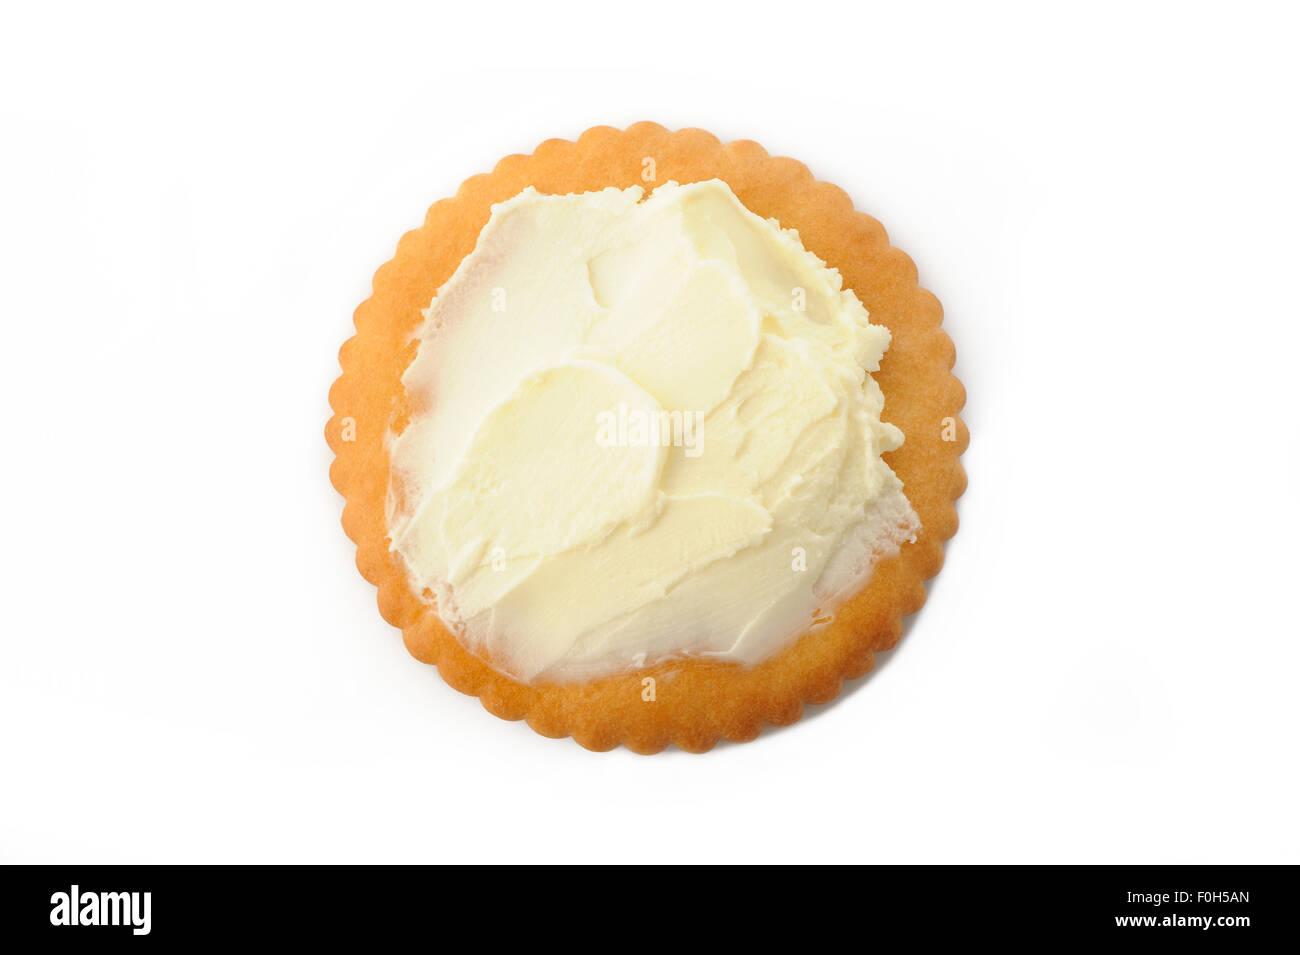 cracker with cream cheese - Stock Image